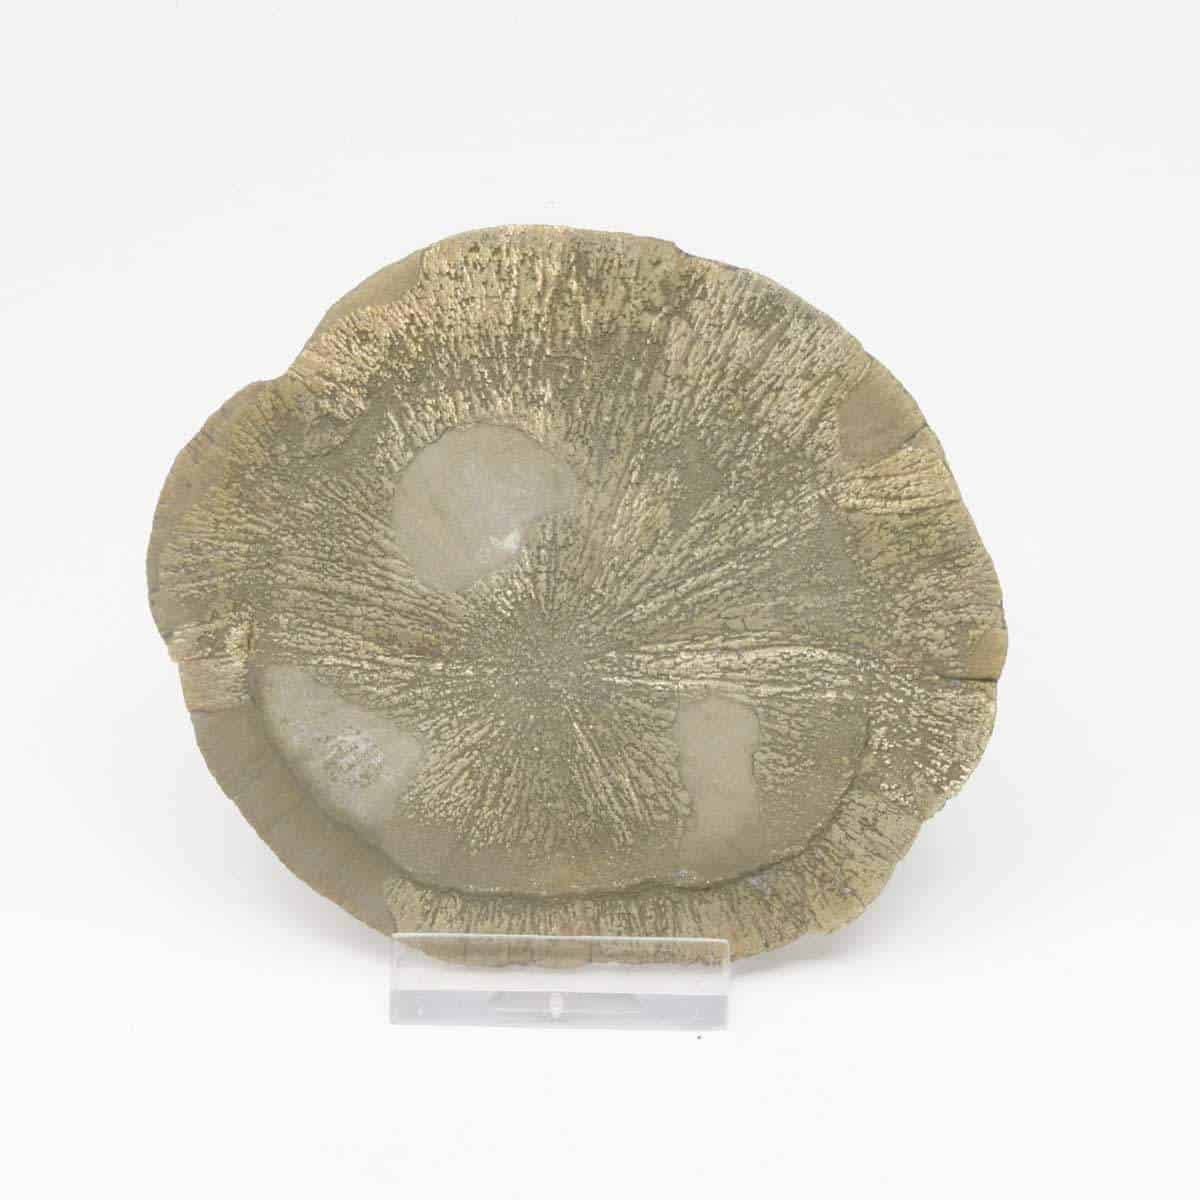 Pyrite soleil ou pyrite dollar